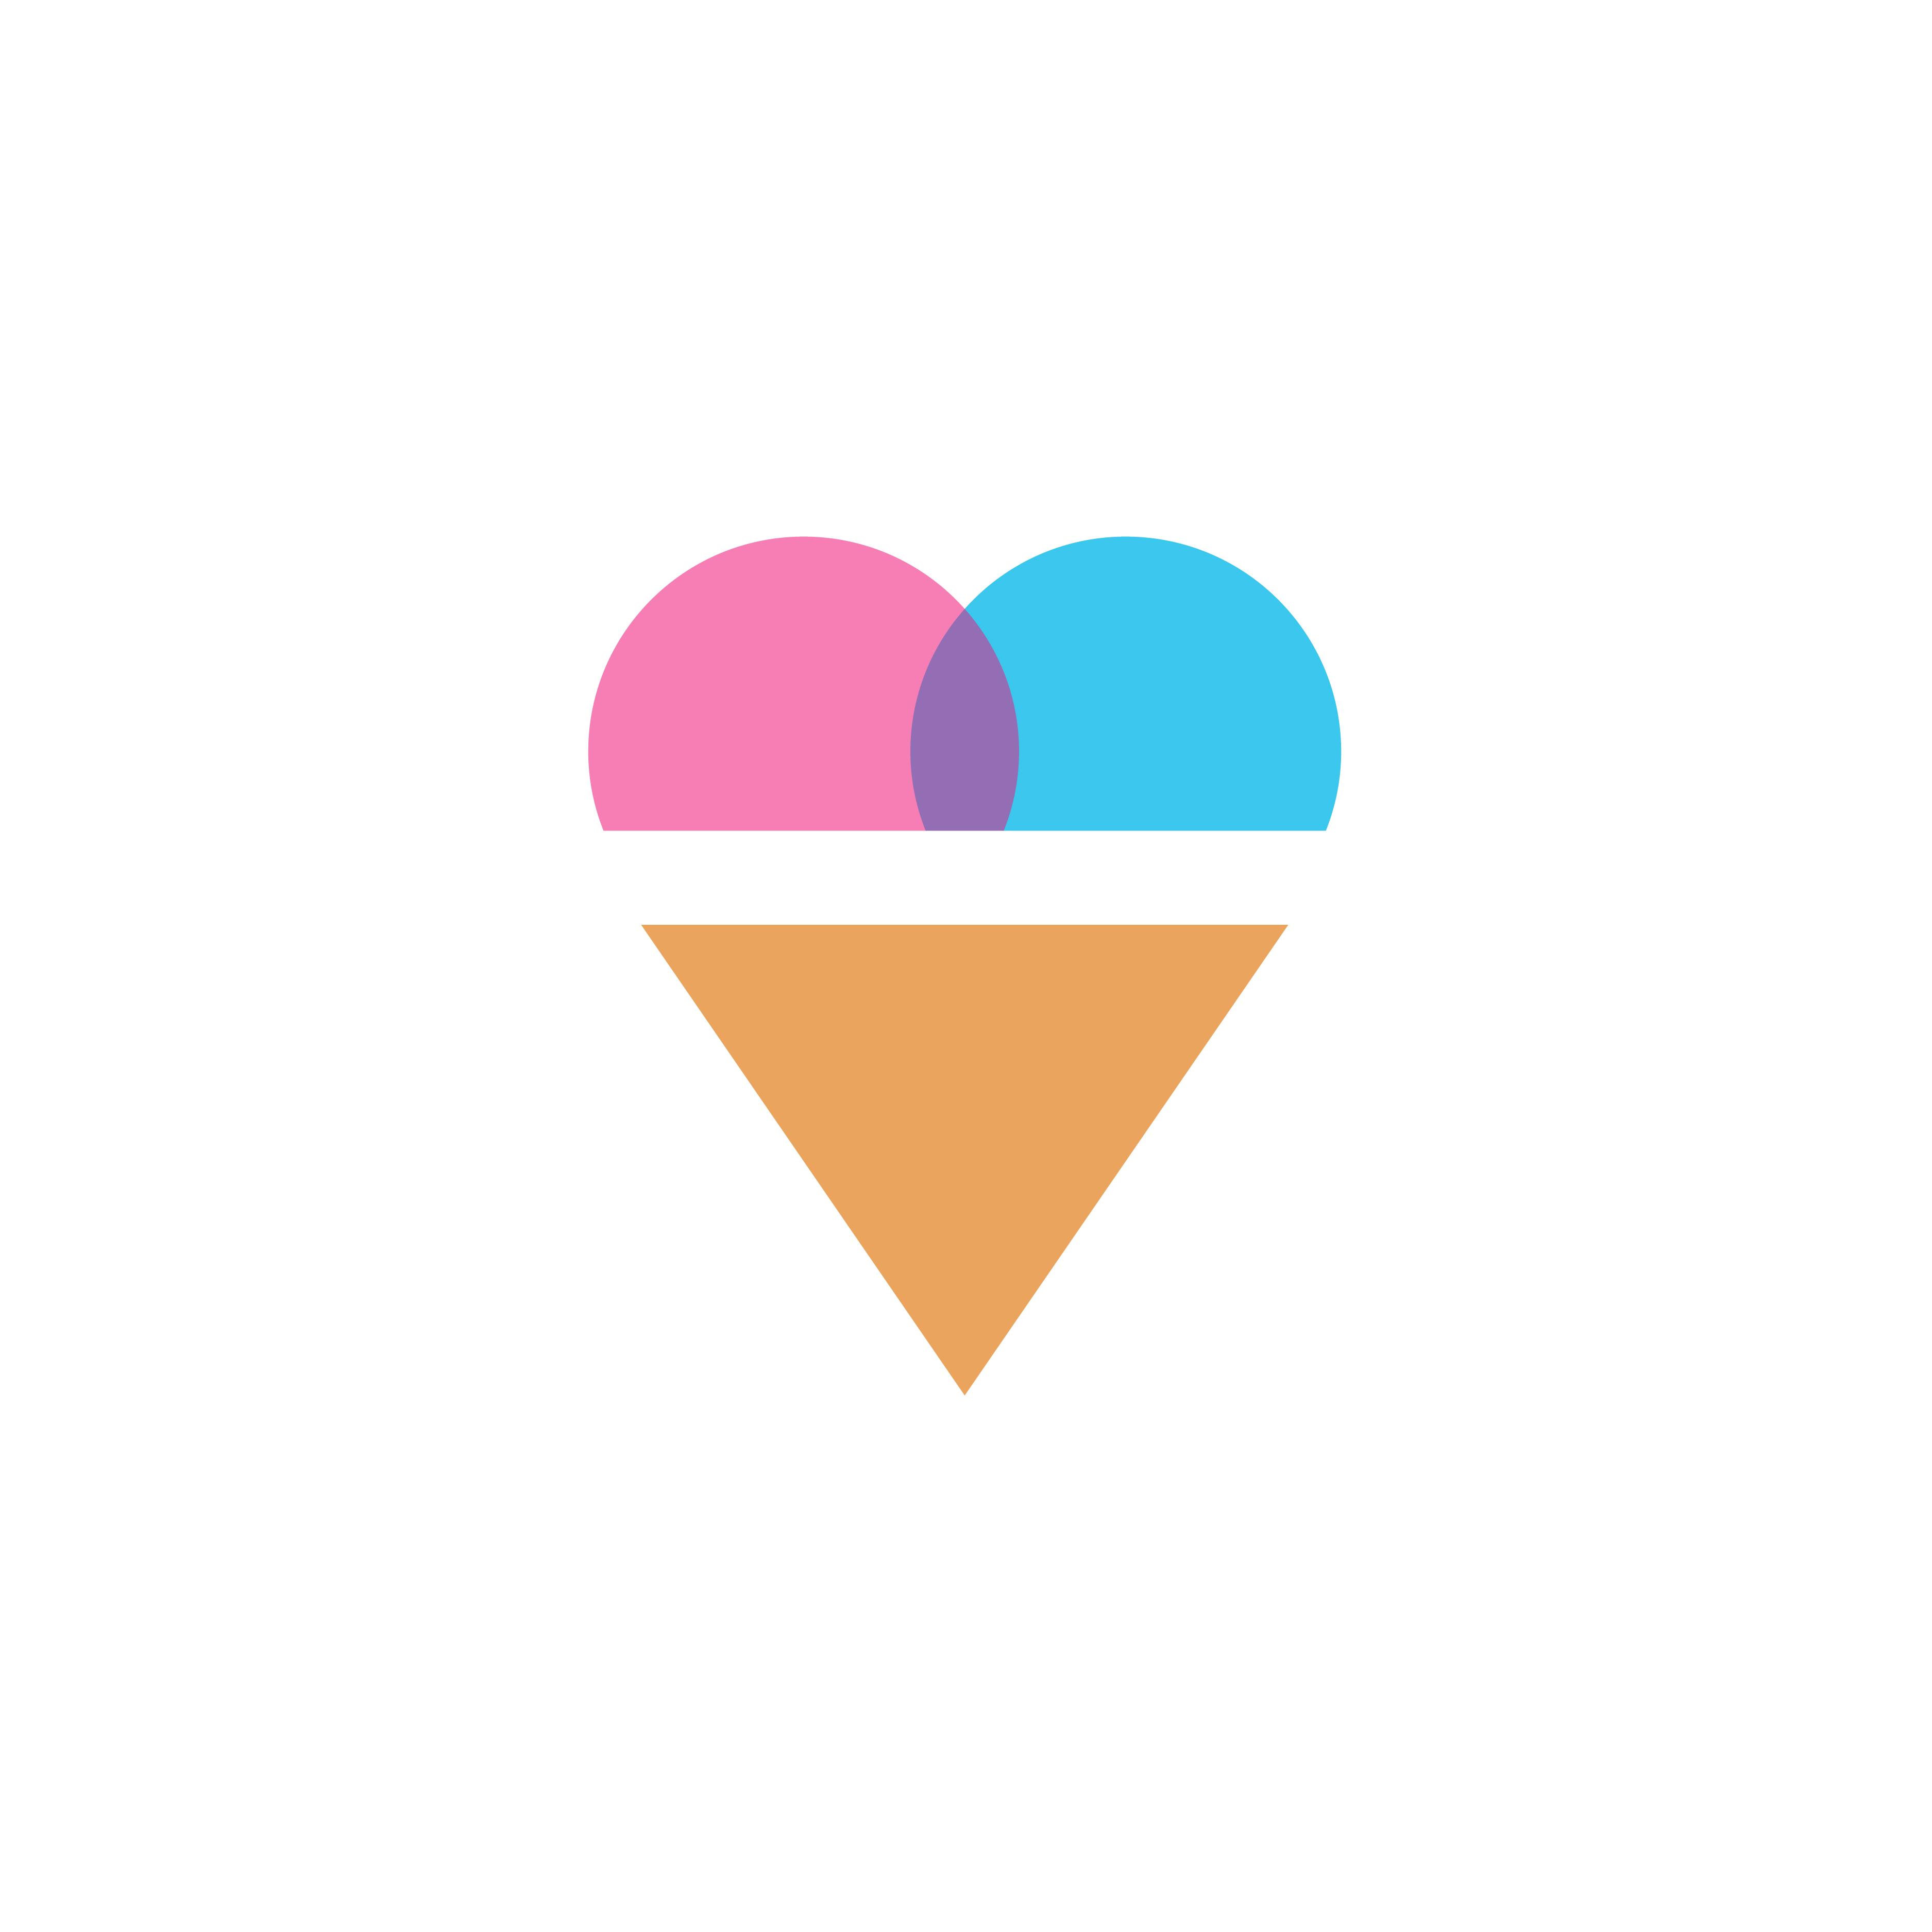 Scoop logo design by logo designer brandclay